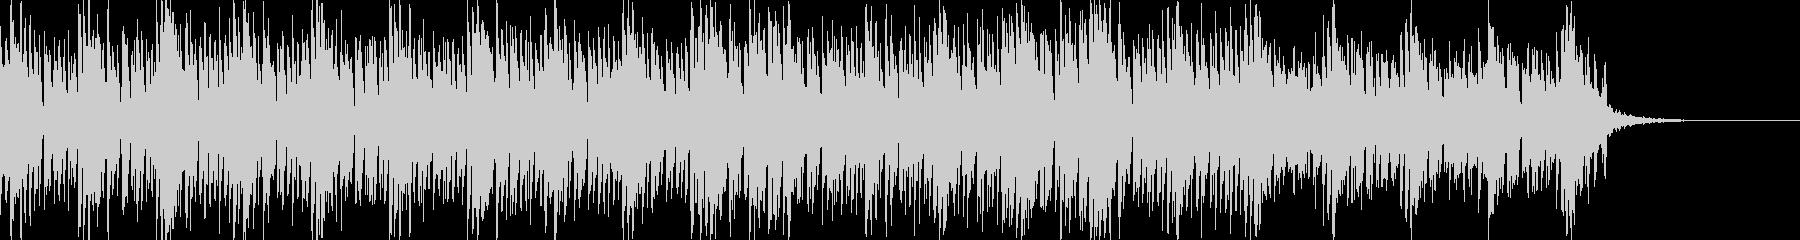 creo_leo_bgm34の未再生の波形